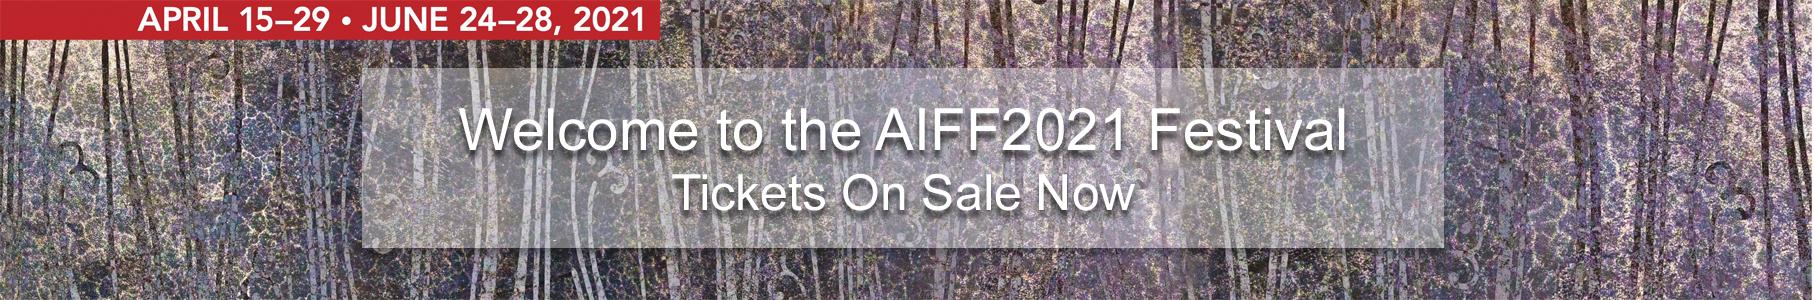 AIFF2021 Festival: LIVE June 24-28